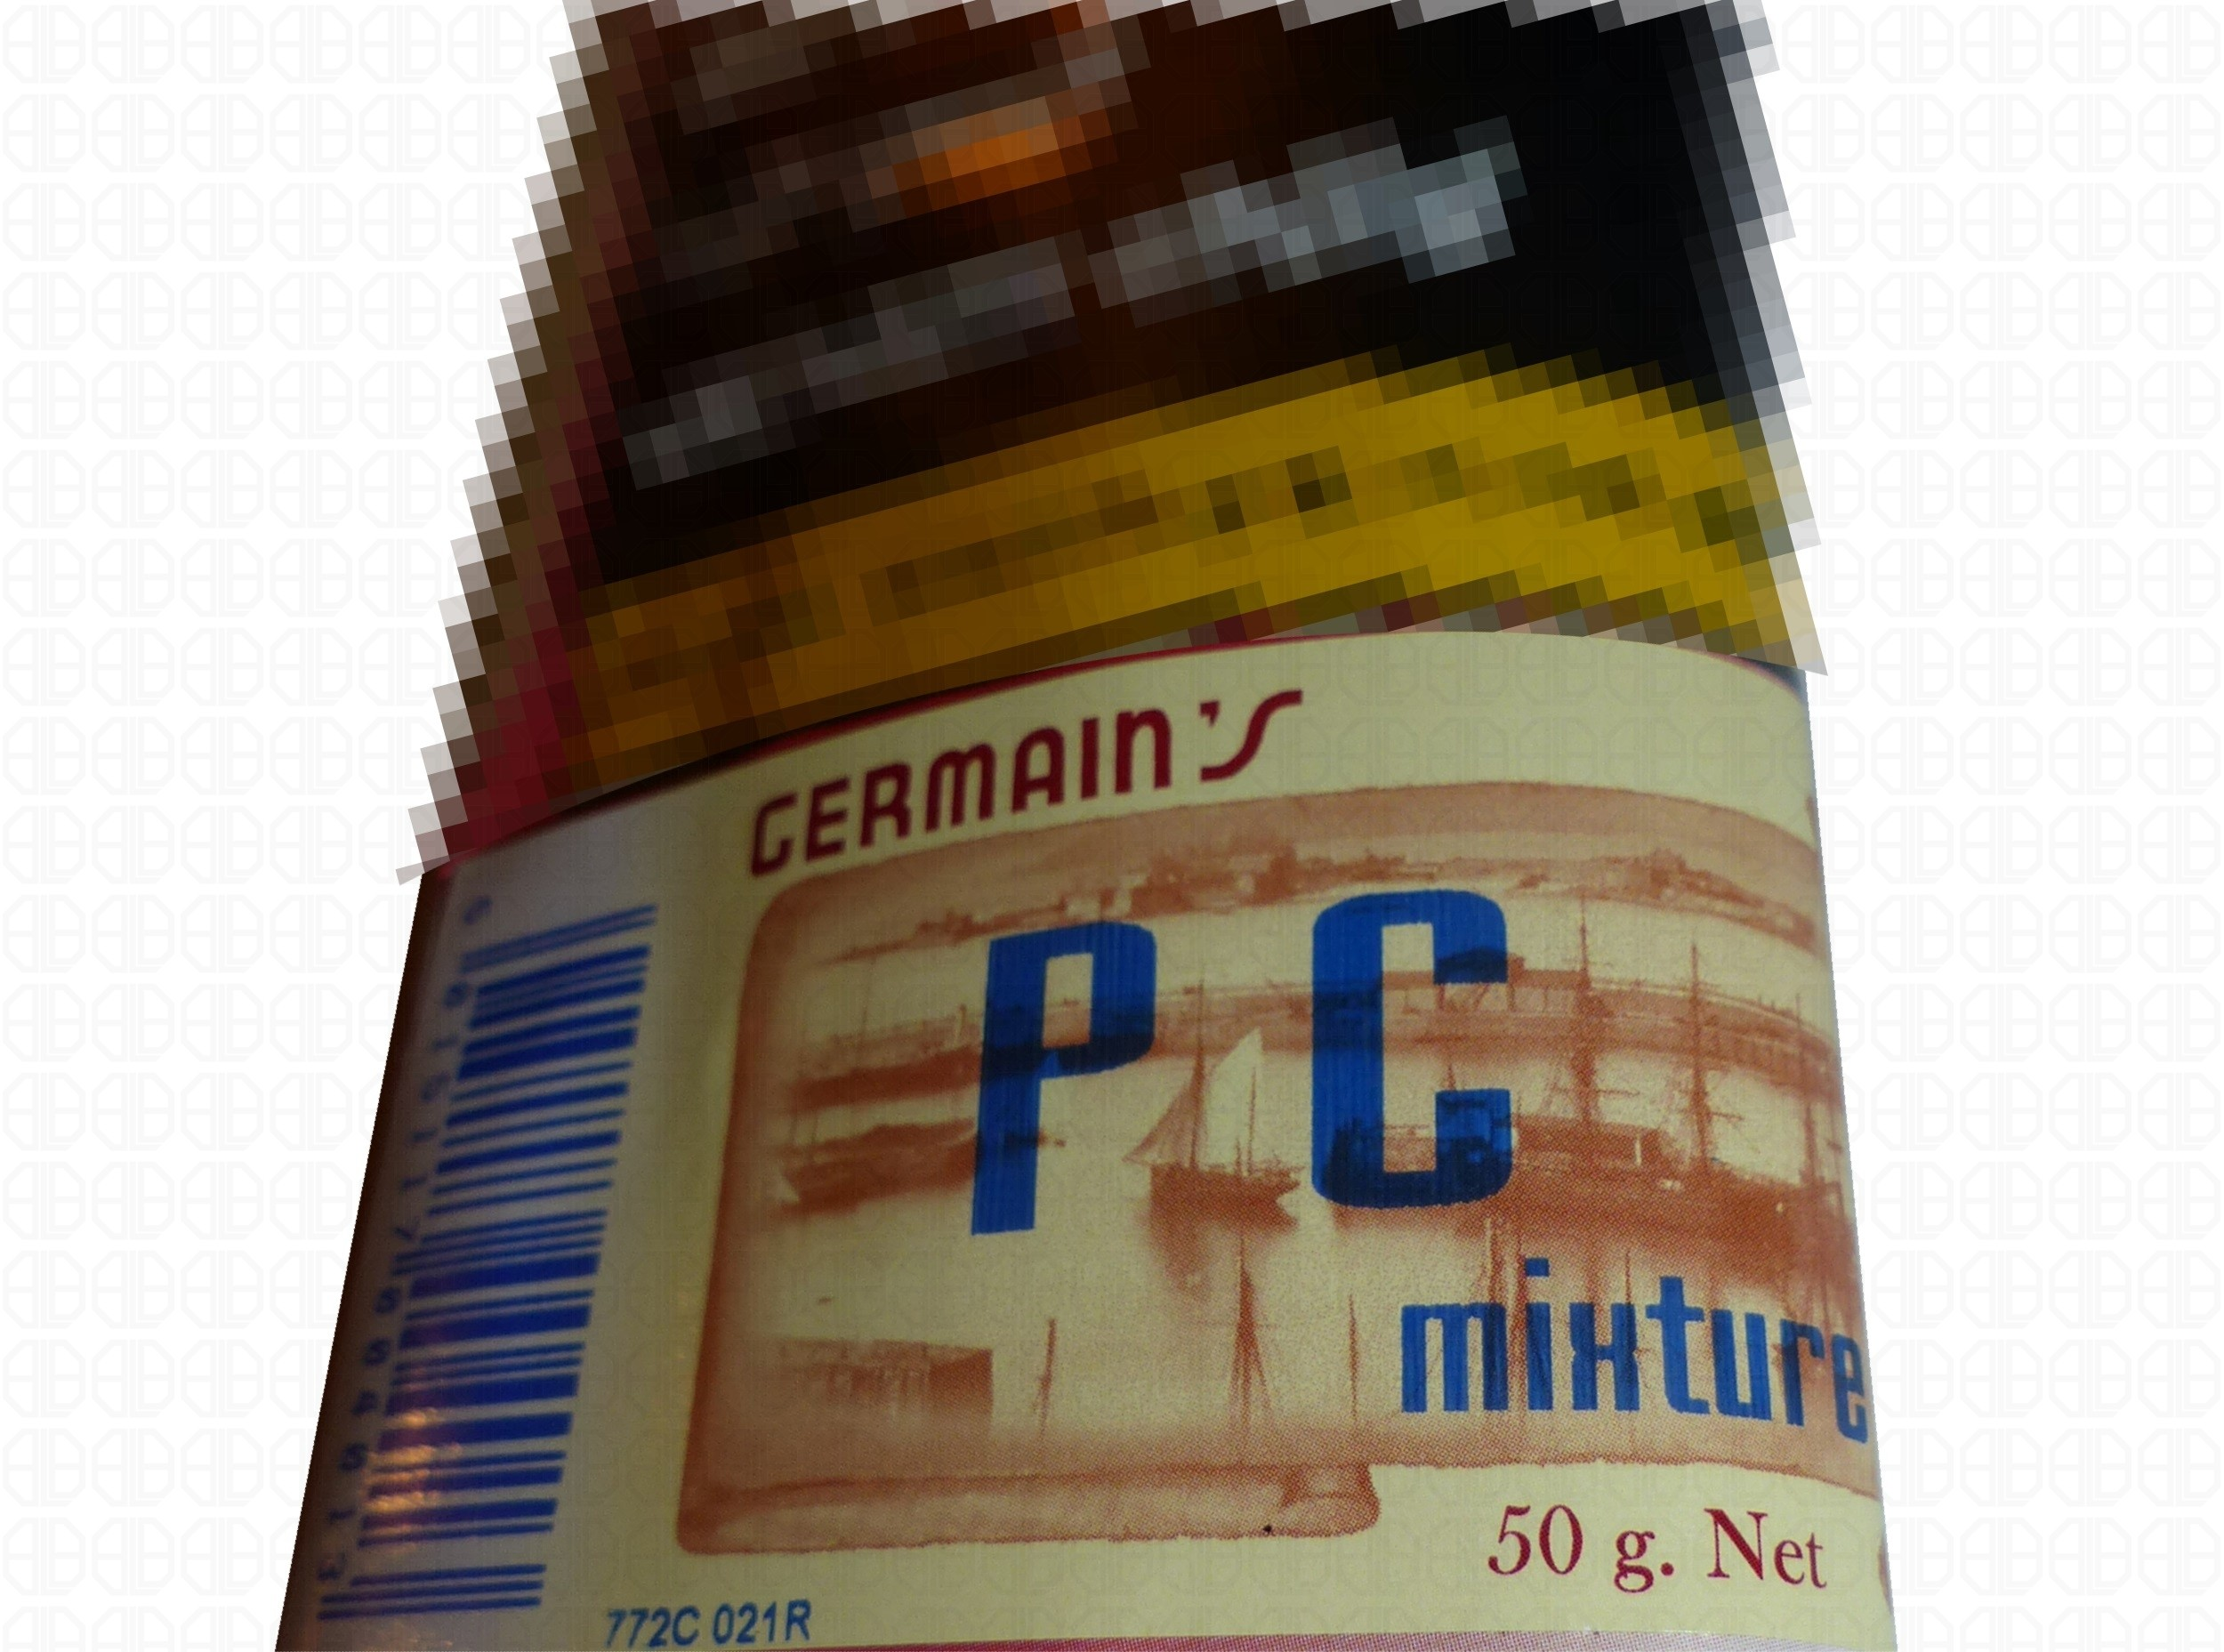 Germains Plum Cake (50g)